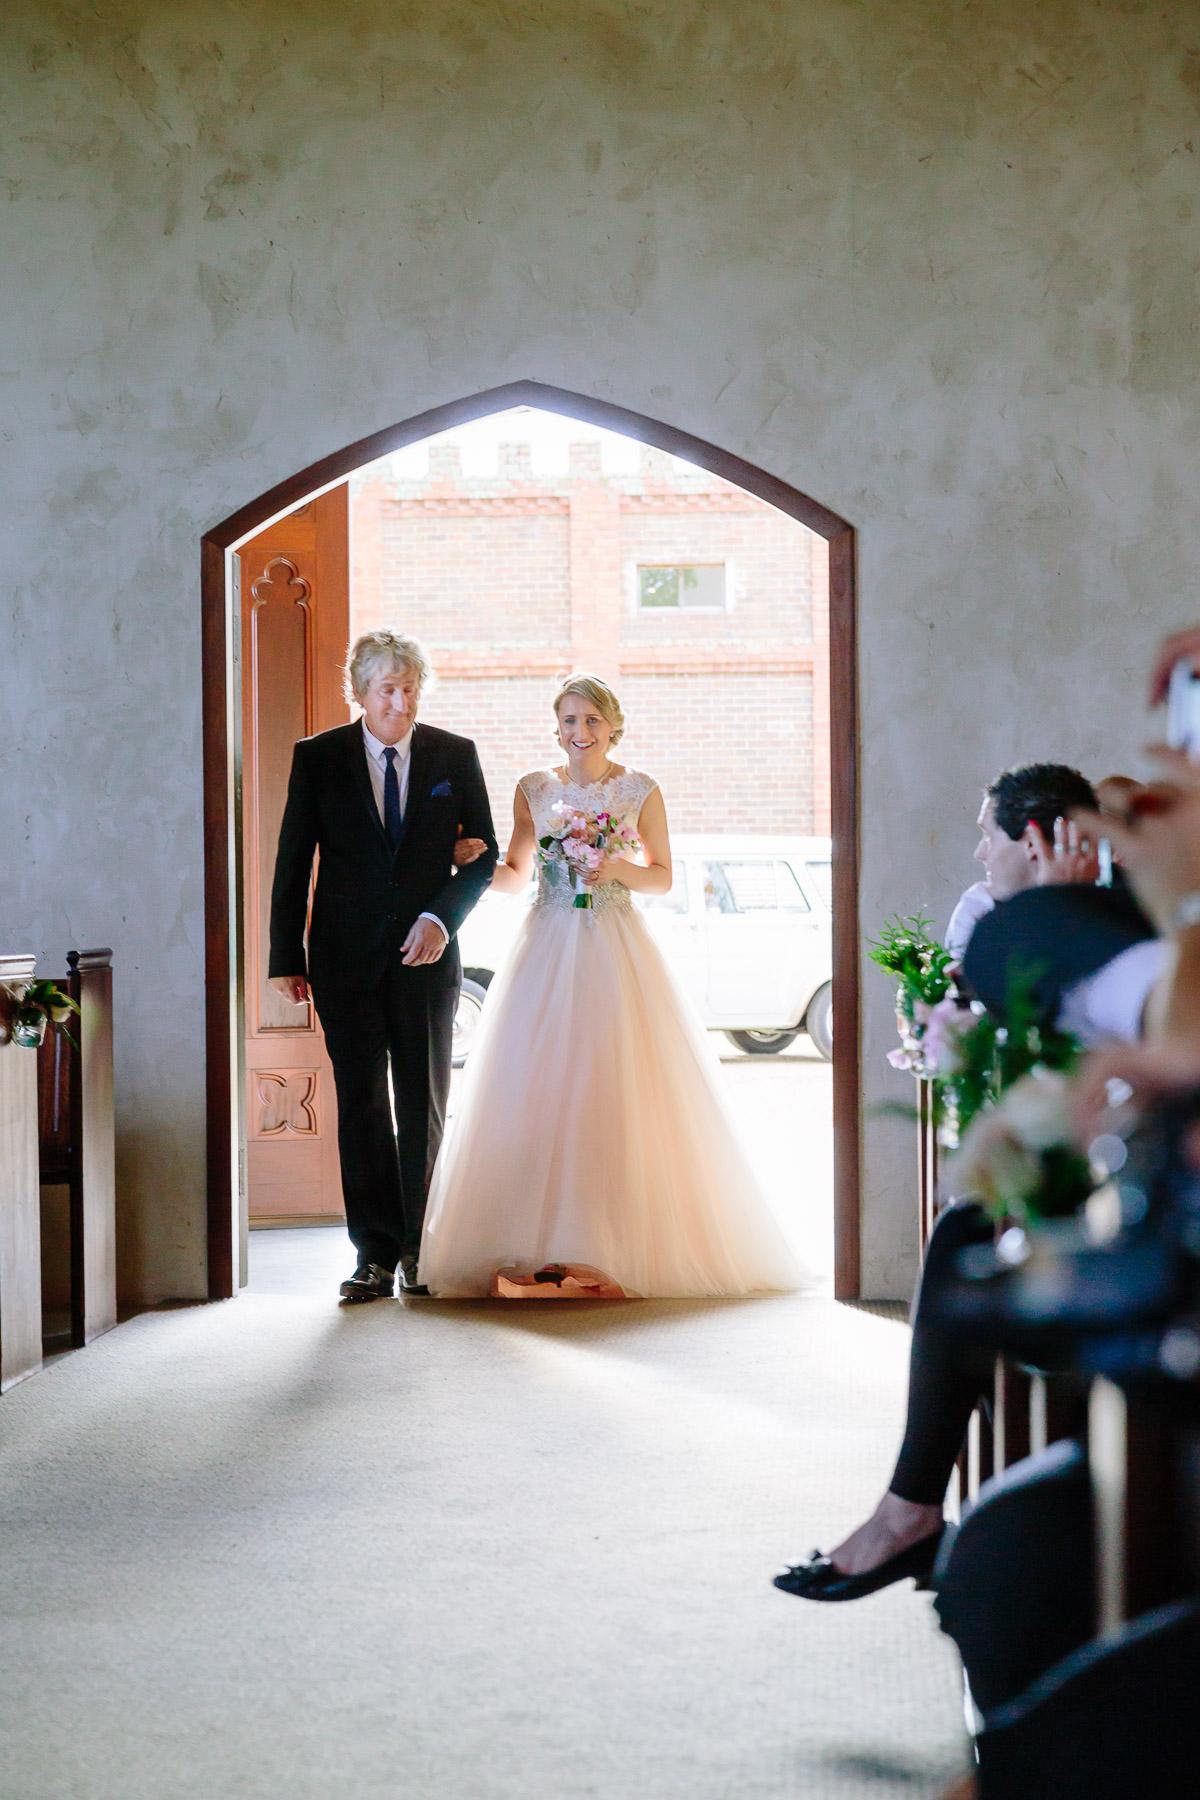 Marnie_and_Charlie_Yarra_Valley_Wedding_Blog-40.jpg